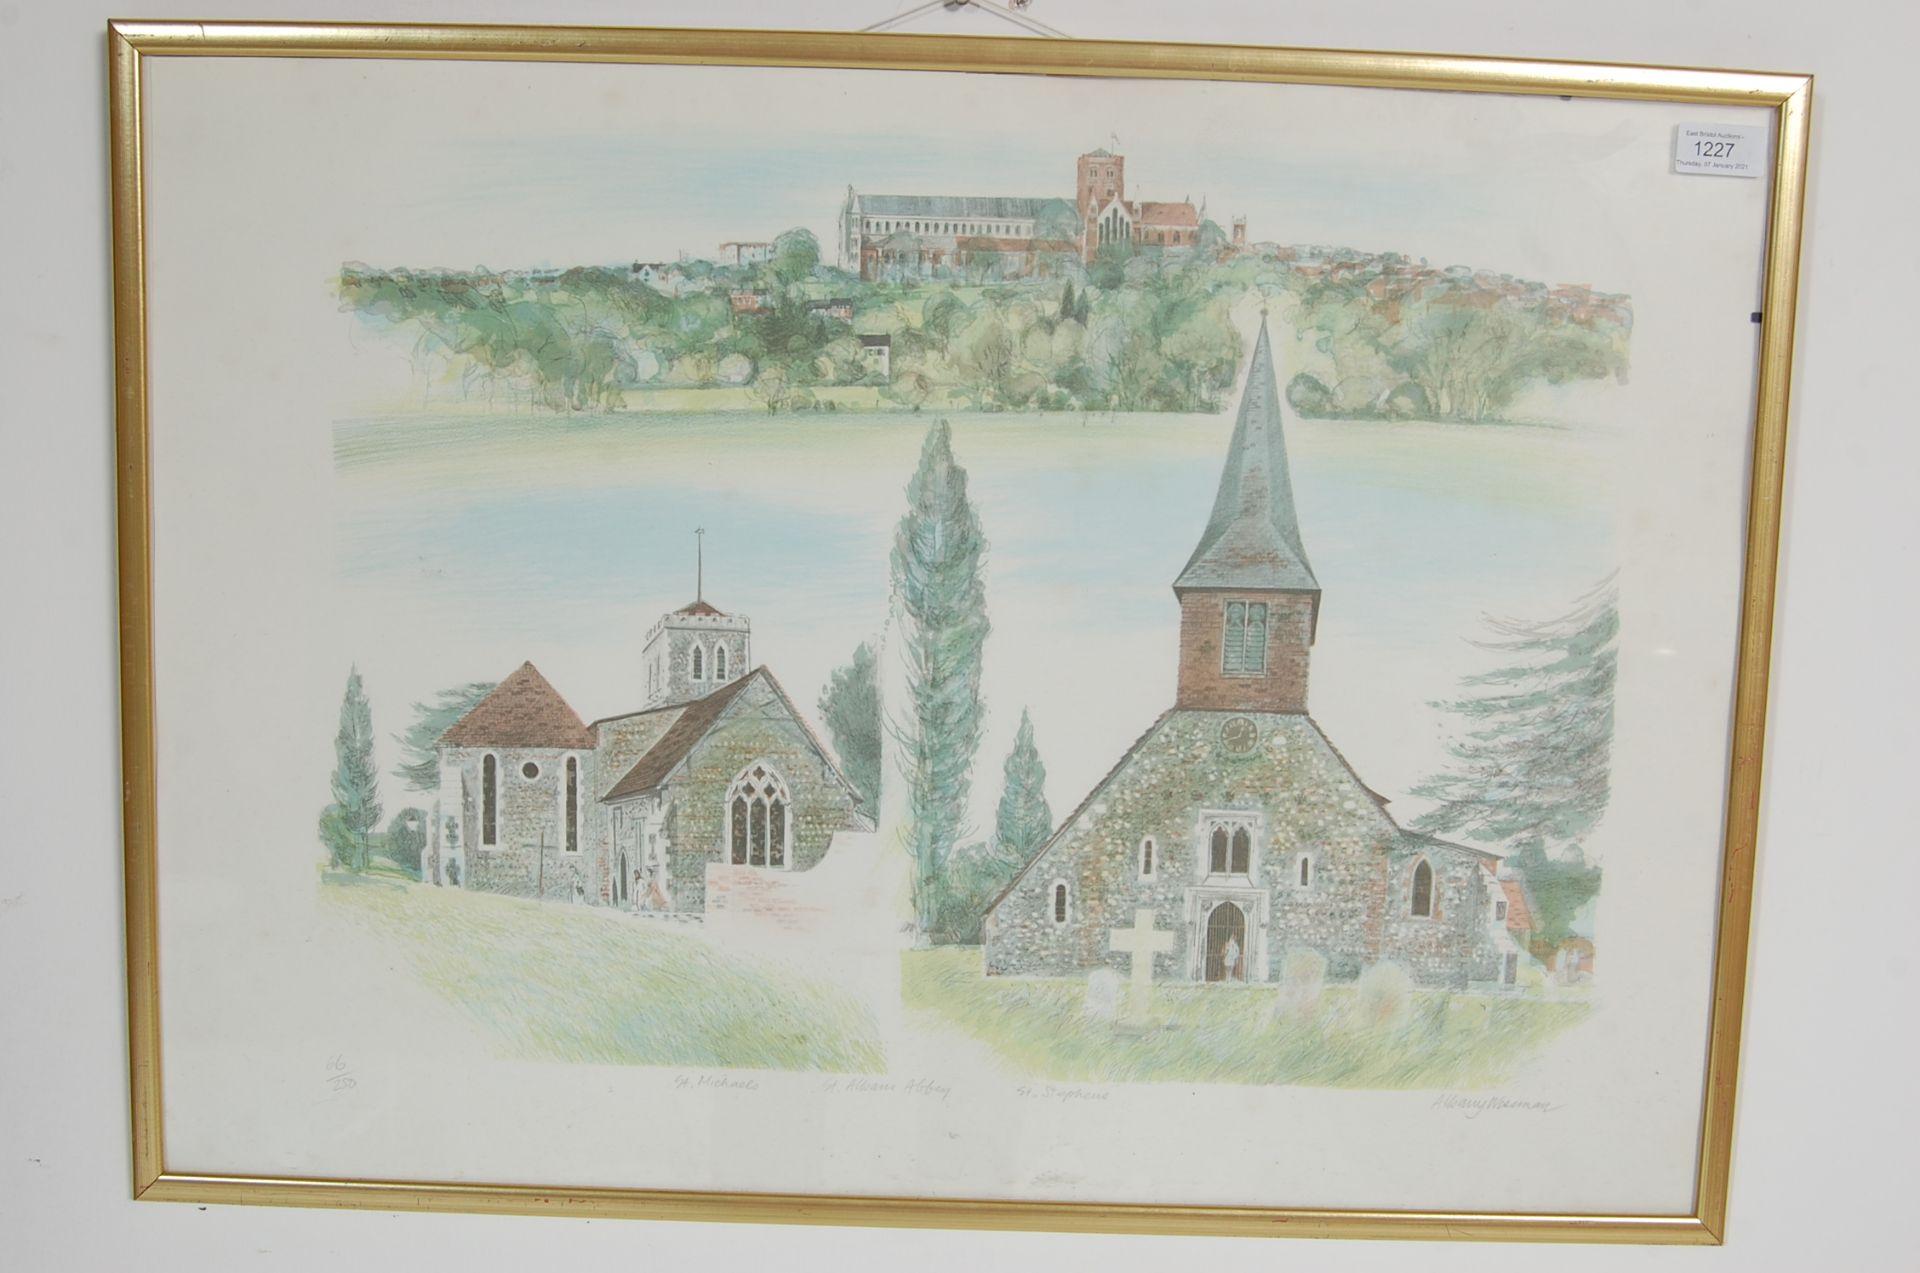 ALBANU WISEMAN LIMITED EDITION LITHOGRAPH OF THREE CHURCHES